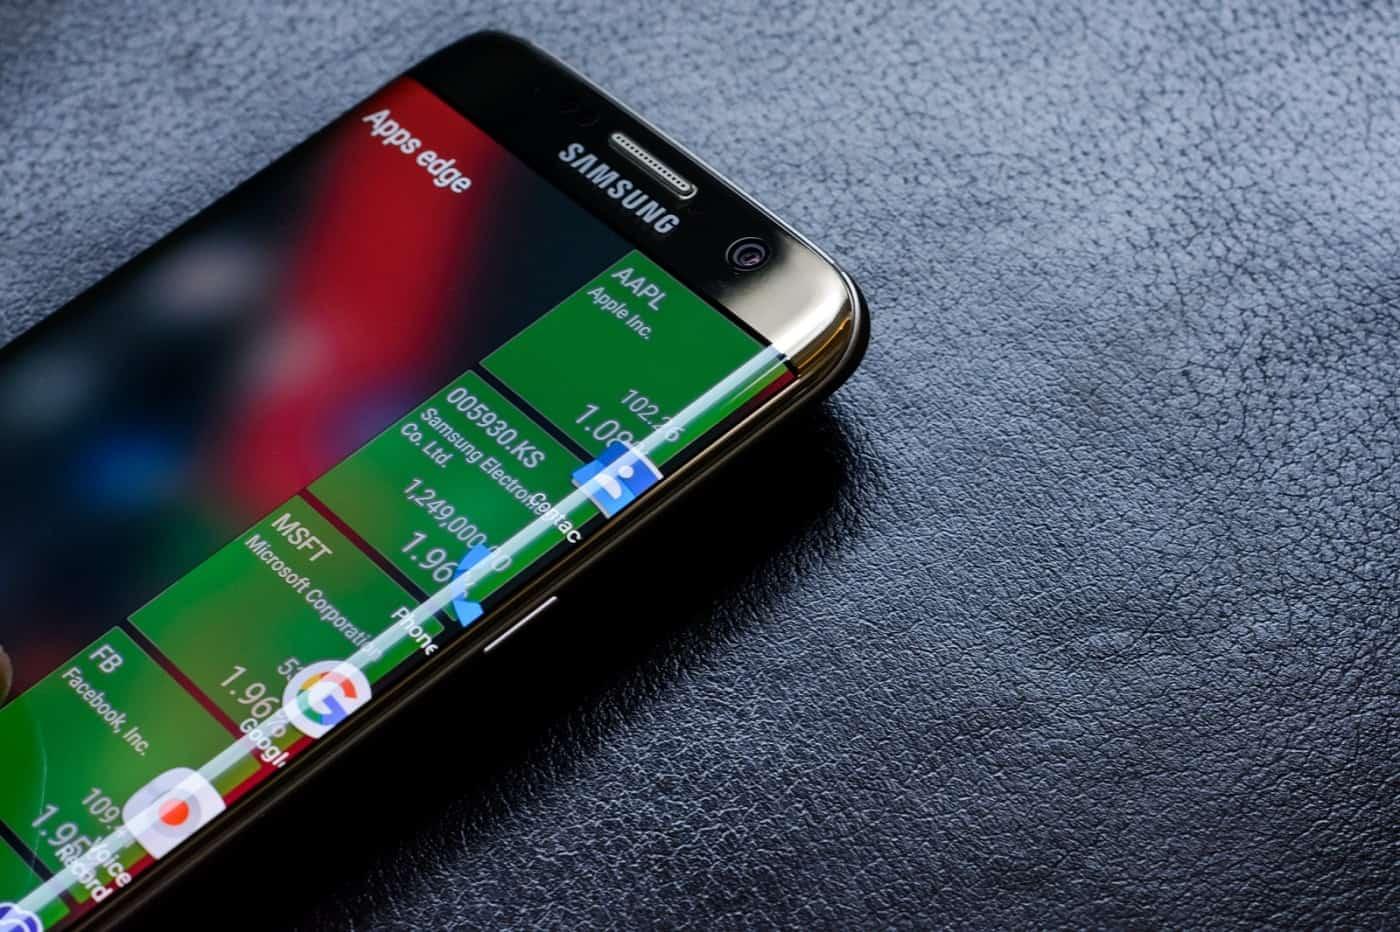 Android Launchers: Οι καλύτεροι δωρεάν launchers για αλλαγή theme